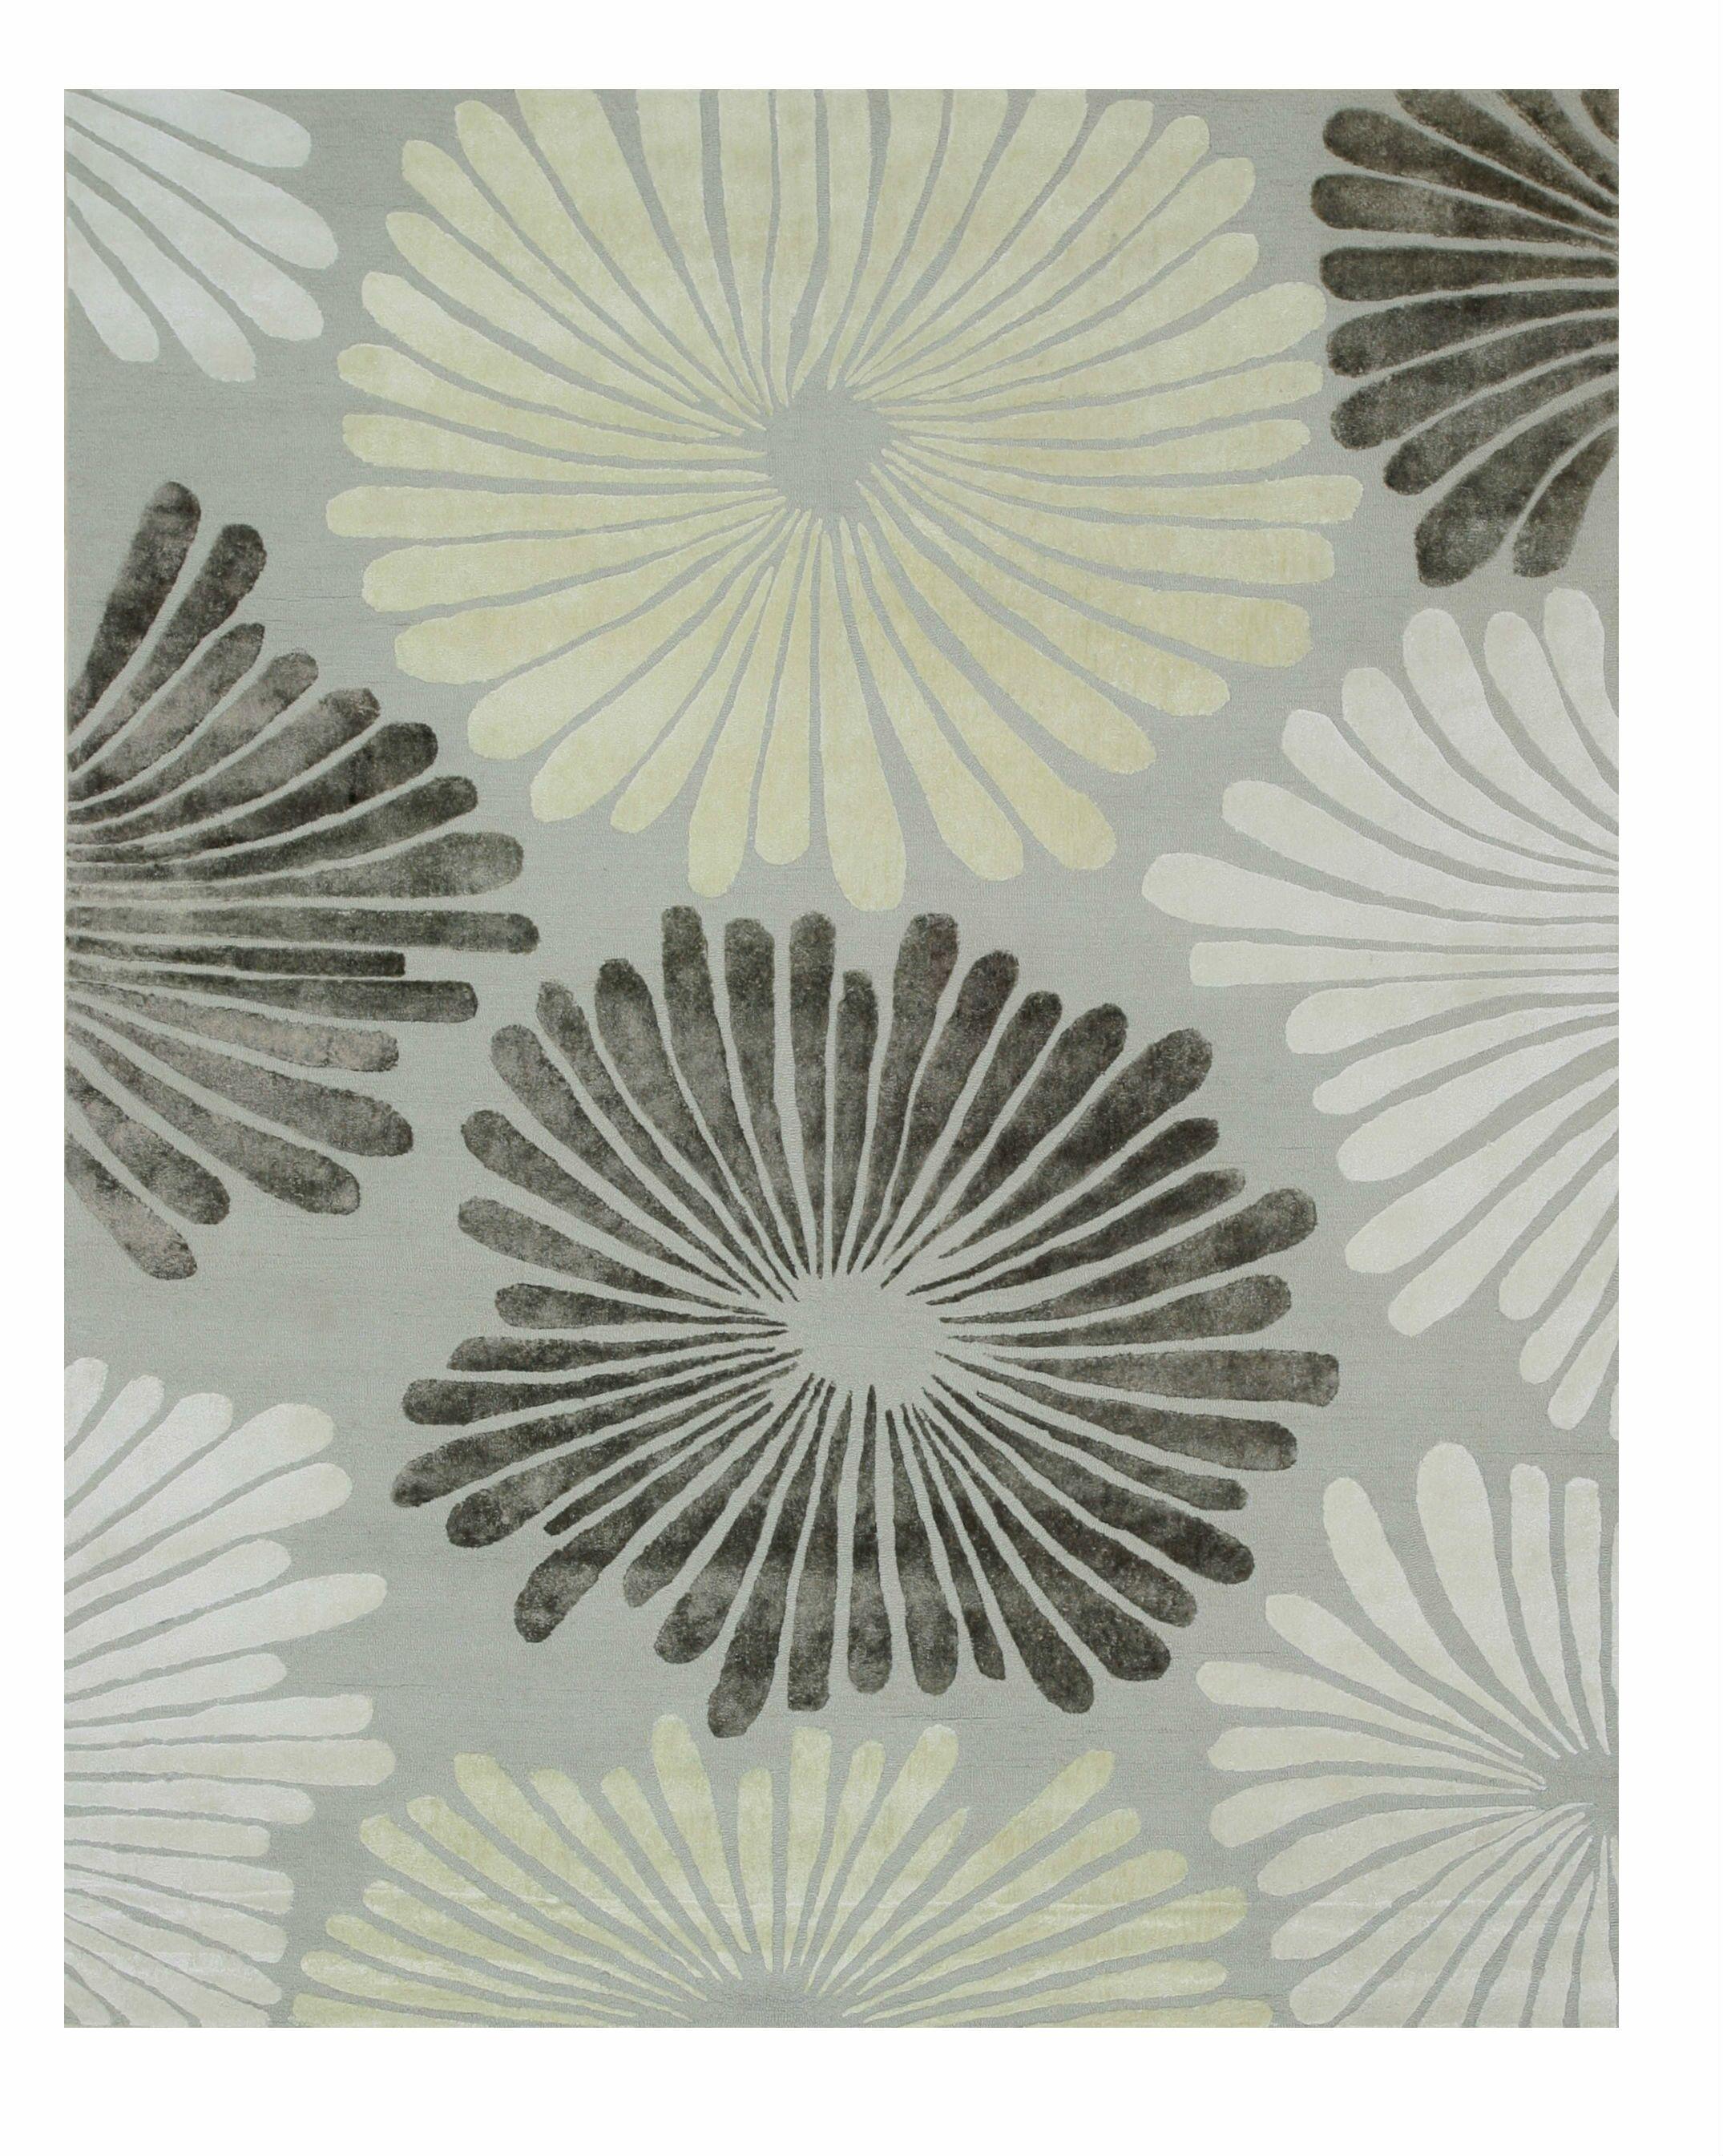 Sunflower Hand-Tufted Gray Area Rug Rug Size: 10' x 14'